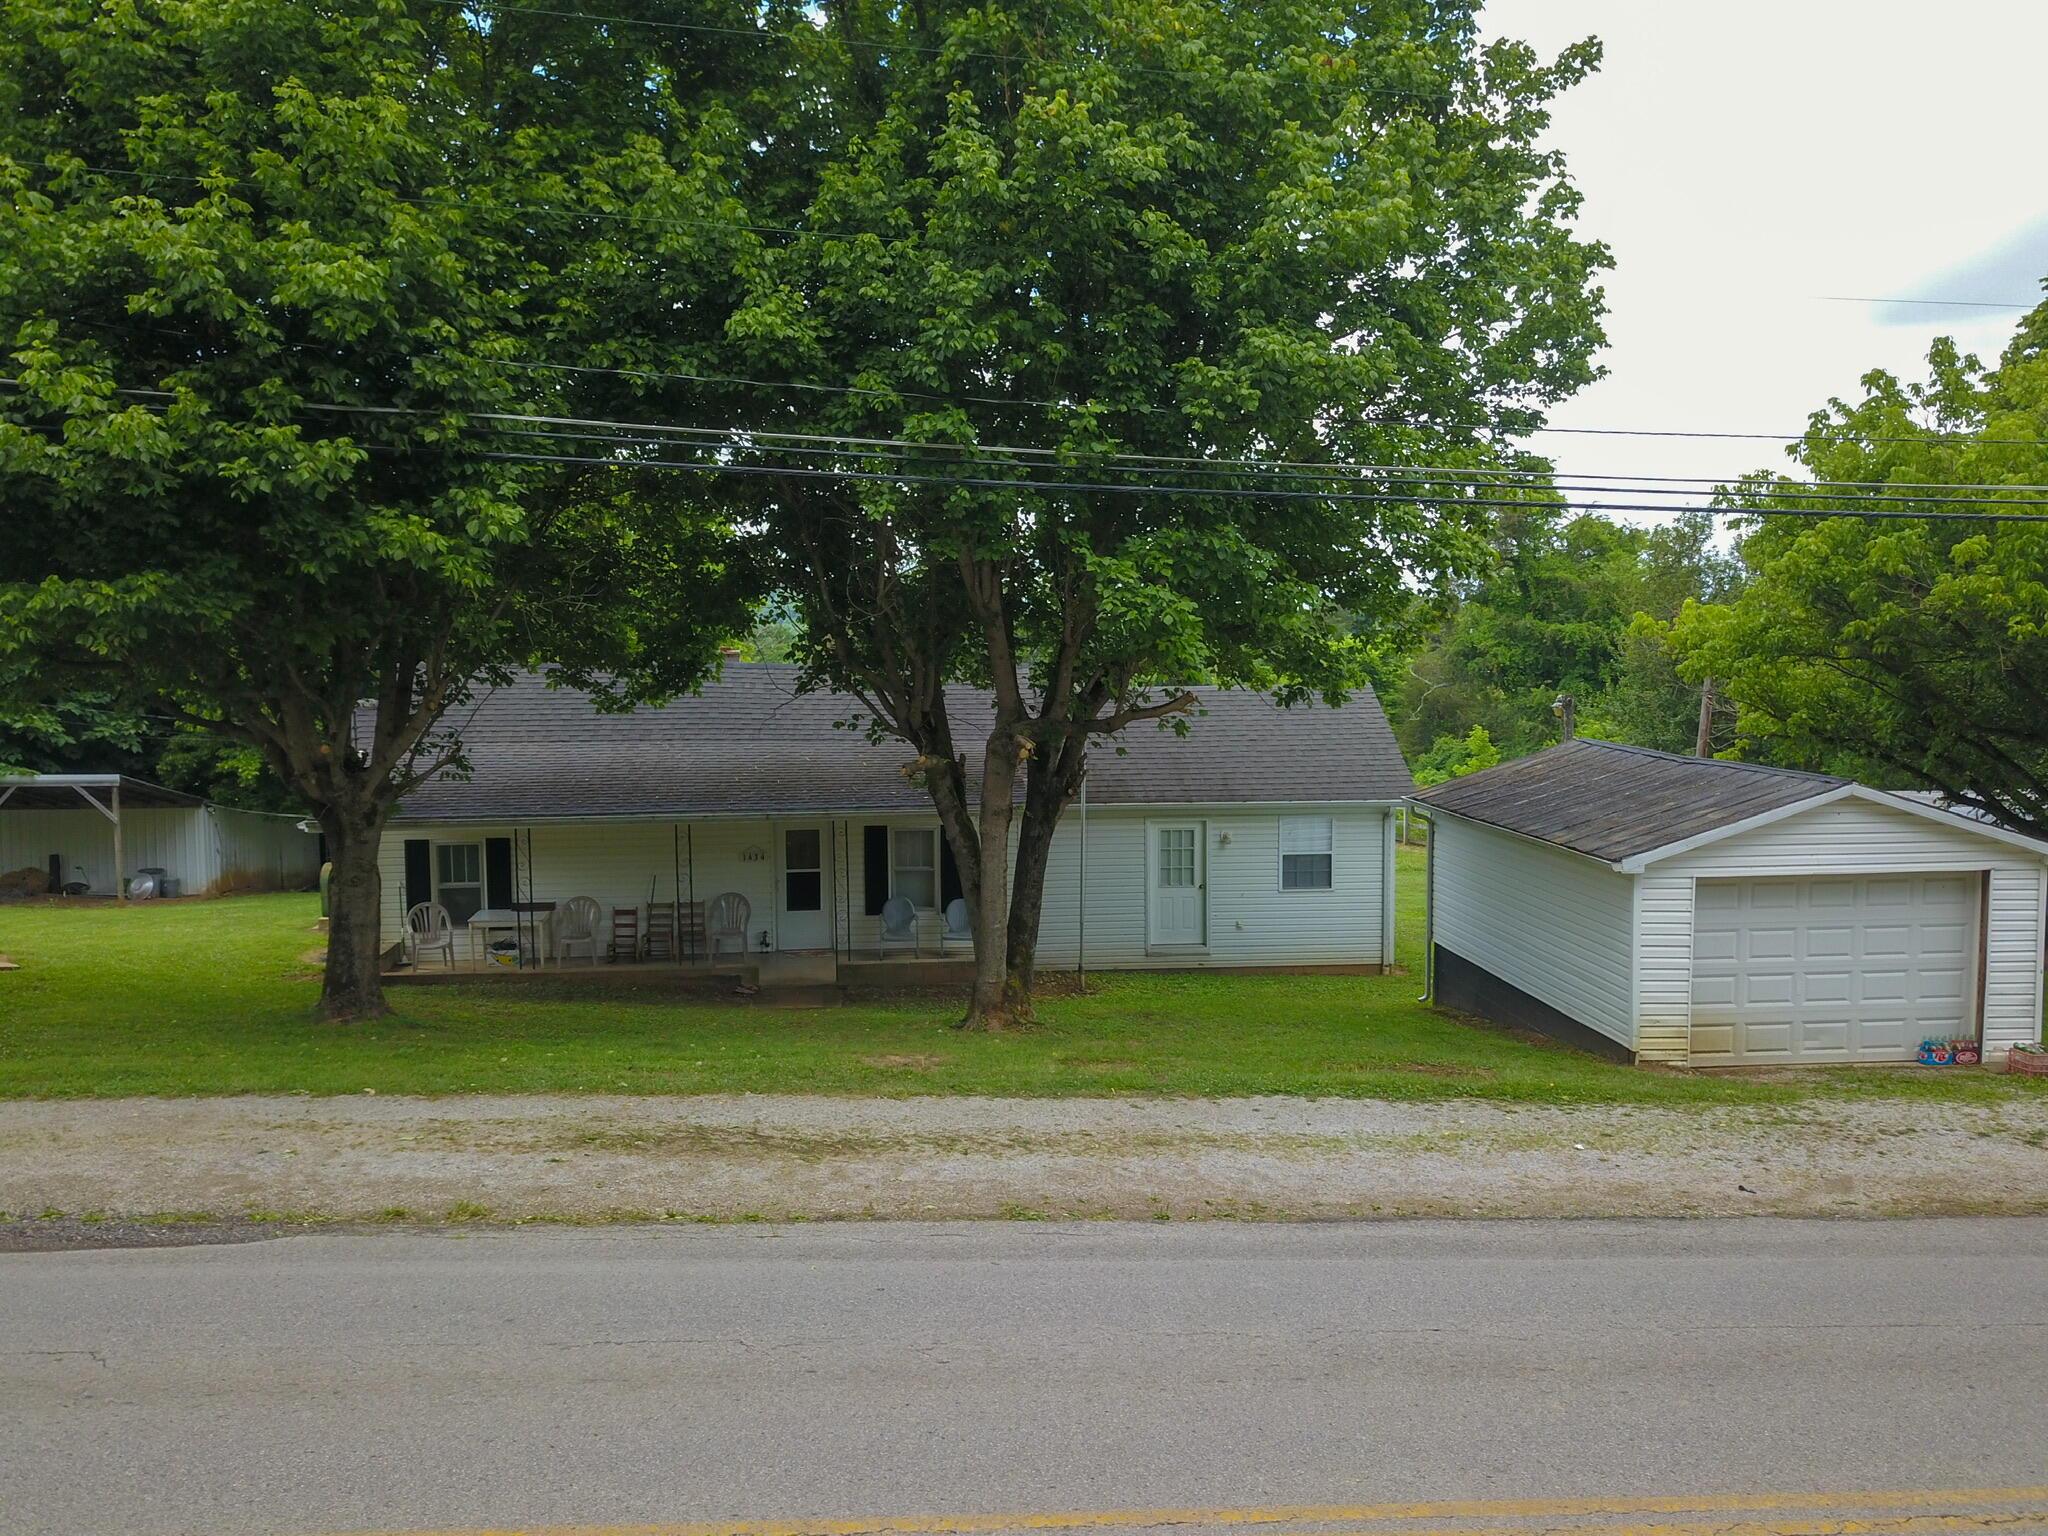 1434 Hwy 167, Monticello, Kentucky 42633, 4 Bedrooms Bedrooms, ,2 BathroomsBathrooms,Residential,For Sale,Hwy 167,20122868